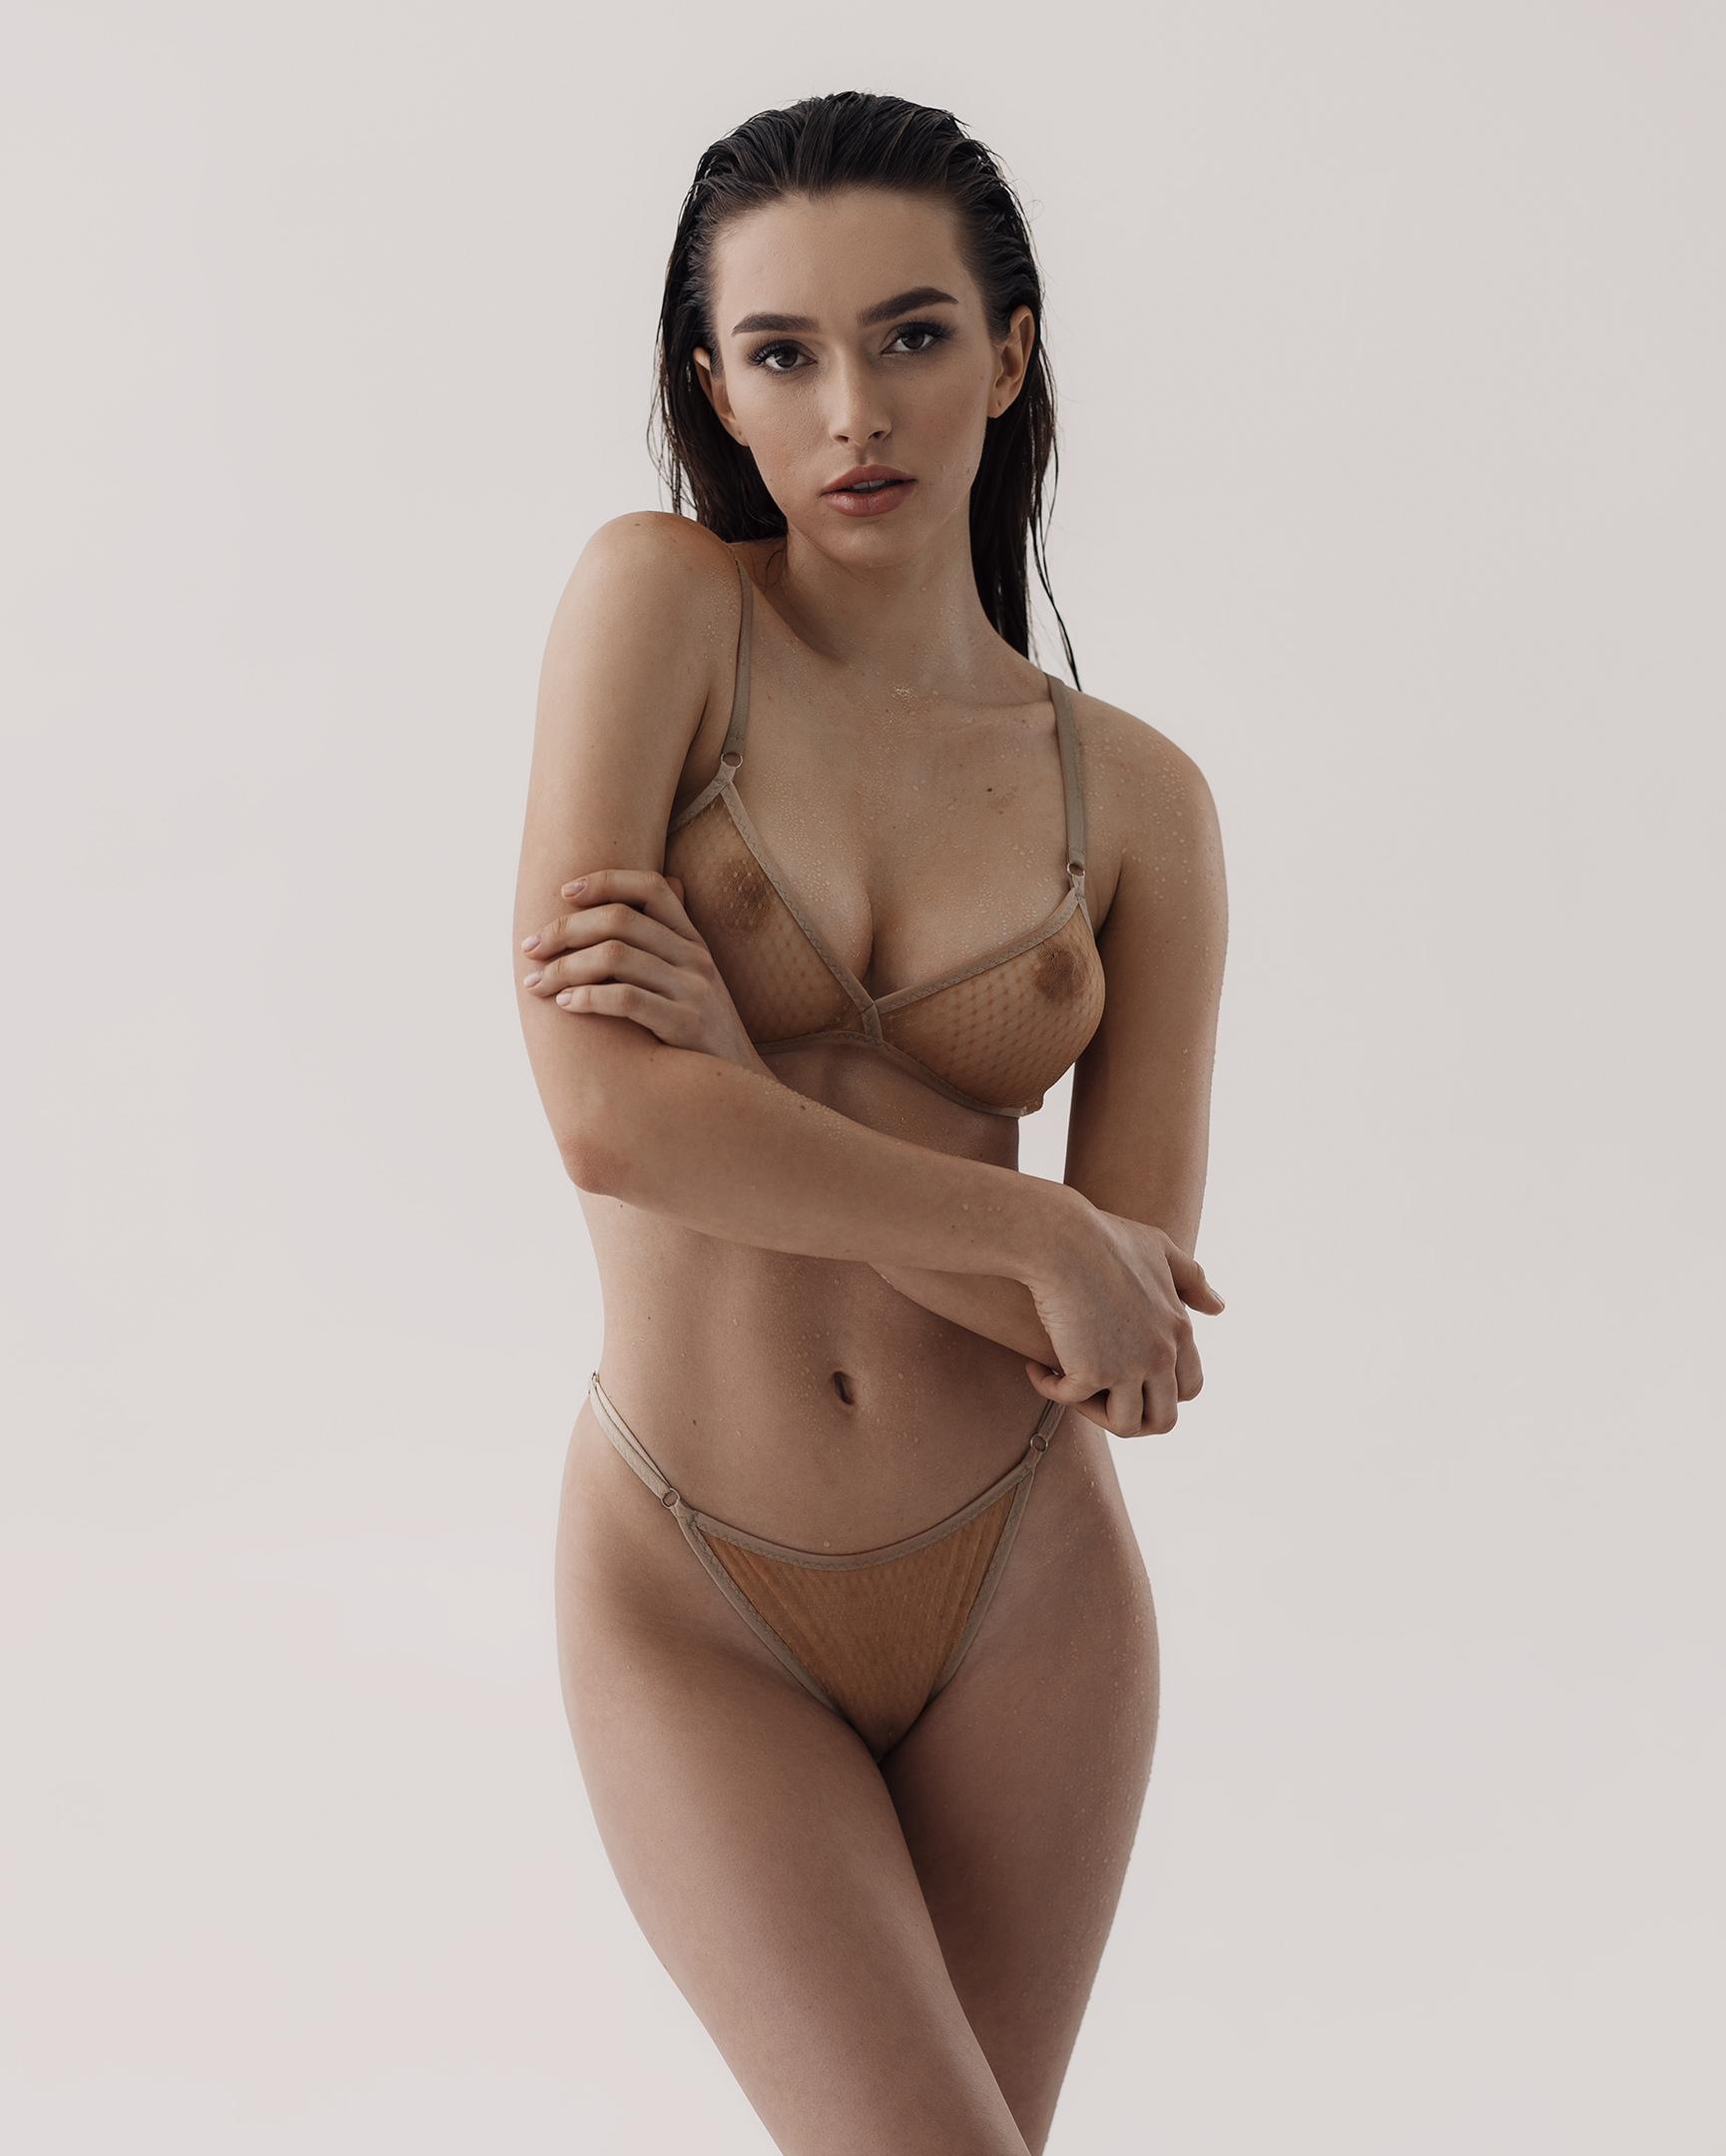 Kristina Yagoda - Stas Shmel photoshoot